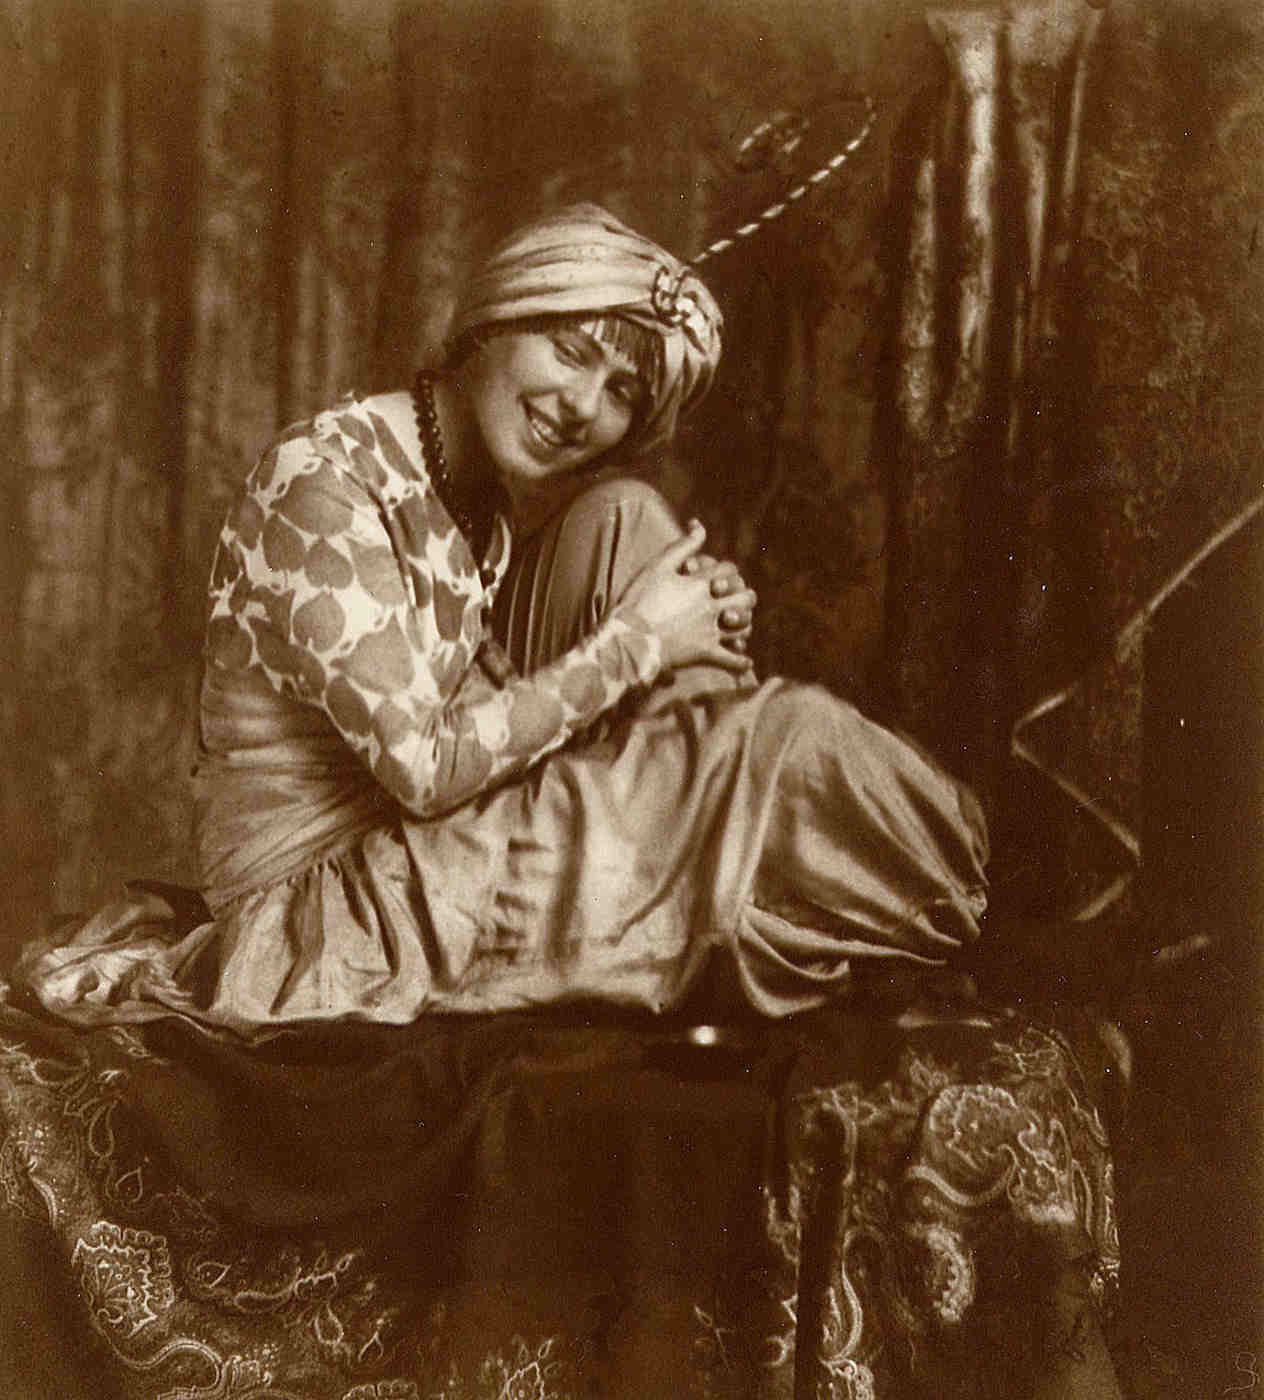 Sophie Taeuber, Munich 1914 | Photo: Eudard Waso – Archiv Stiftung Arp e. V., Berlin/Rolandswerth